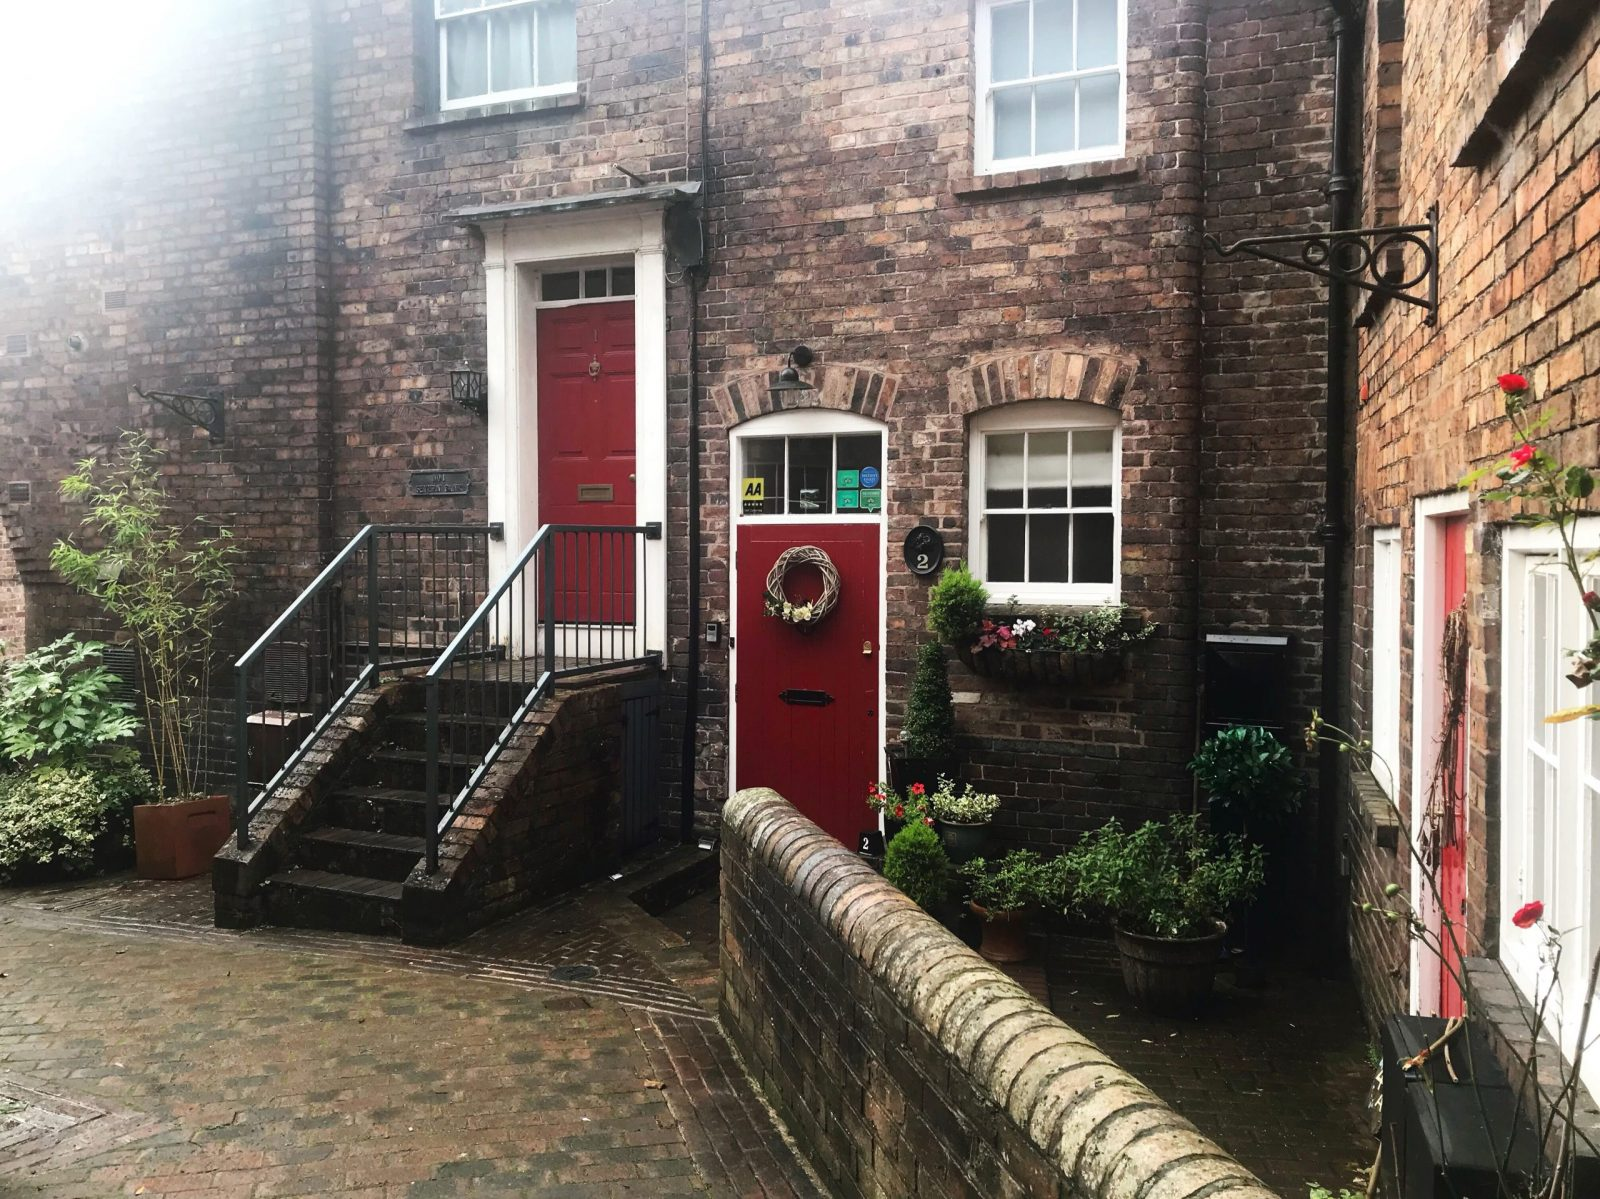 Visiting Ironbridge a 3 day itinerary Ironbridge view townhouse